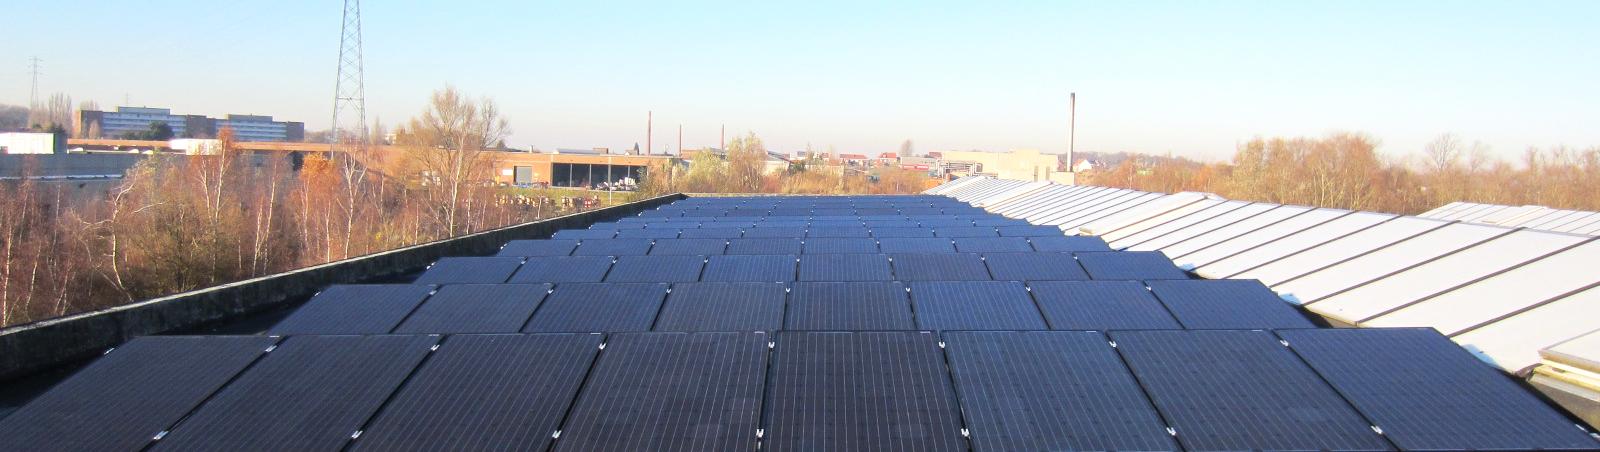 Almeco solar pannels